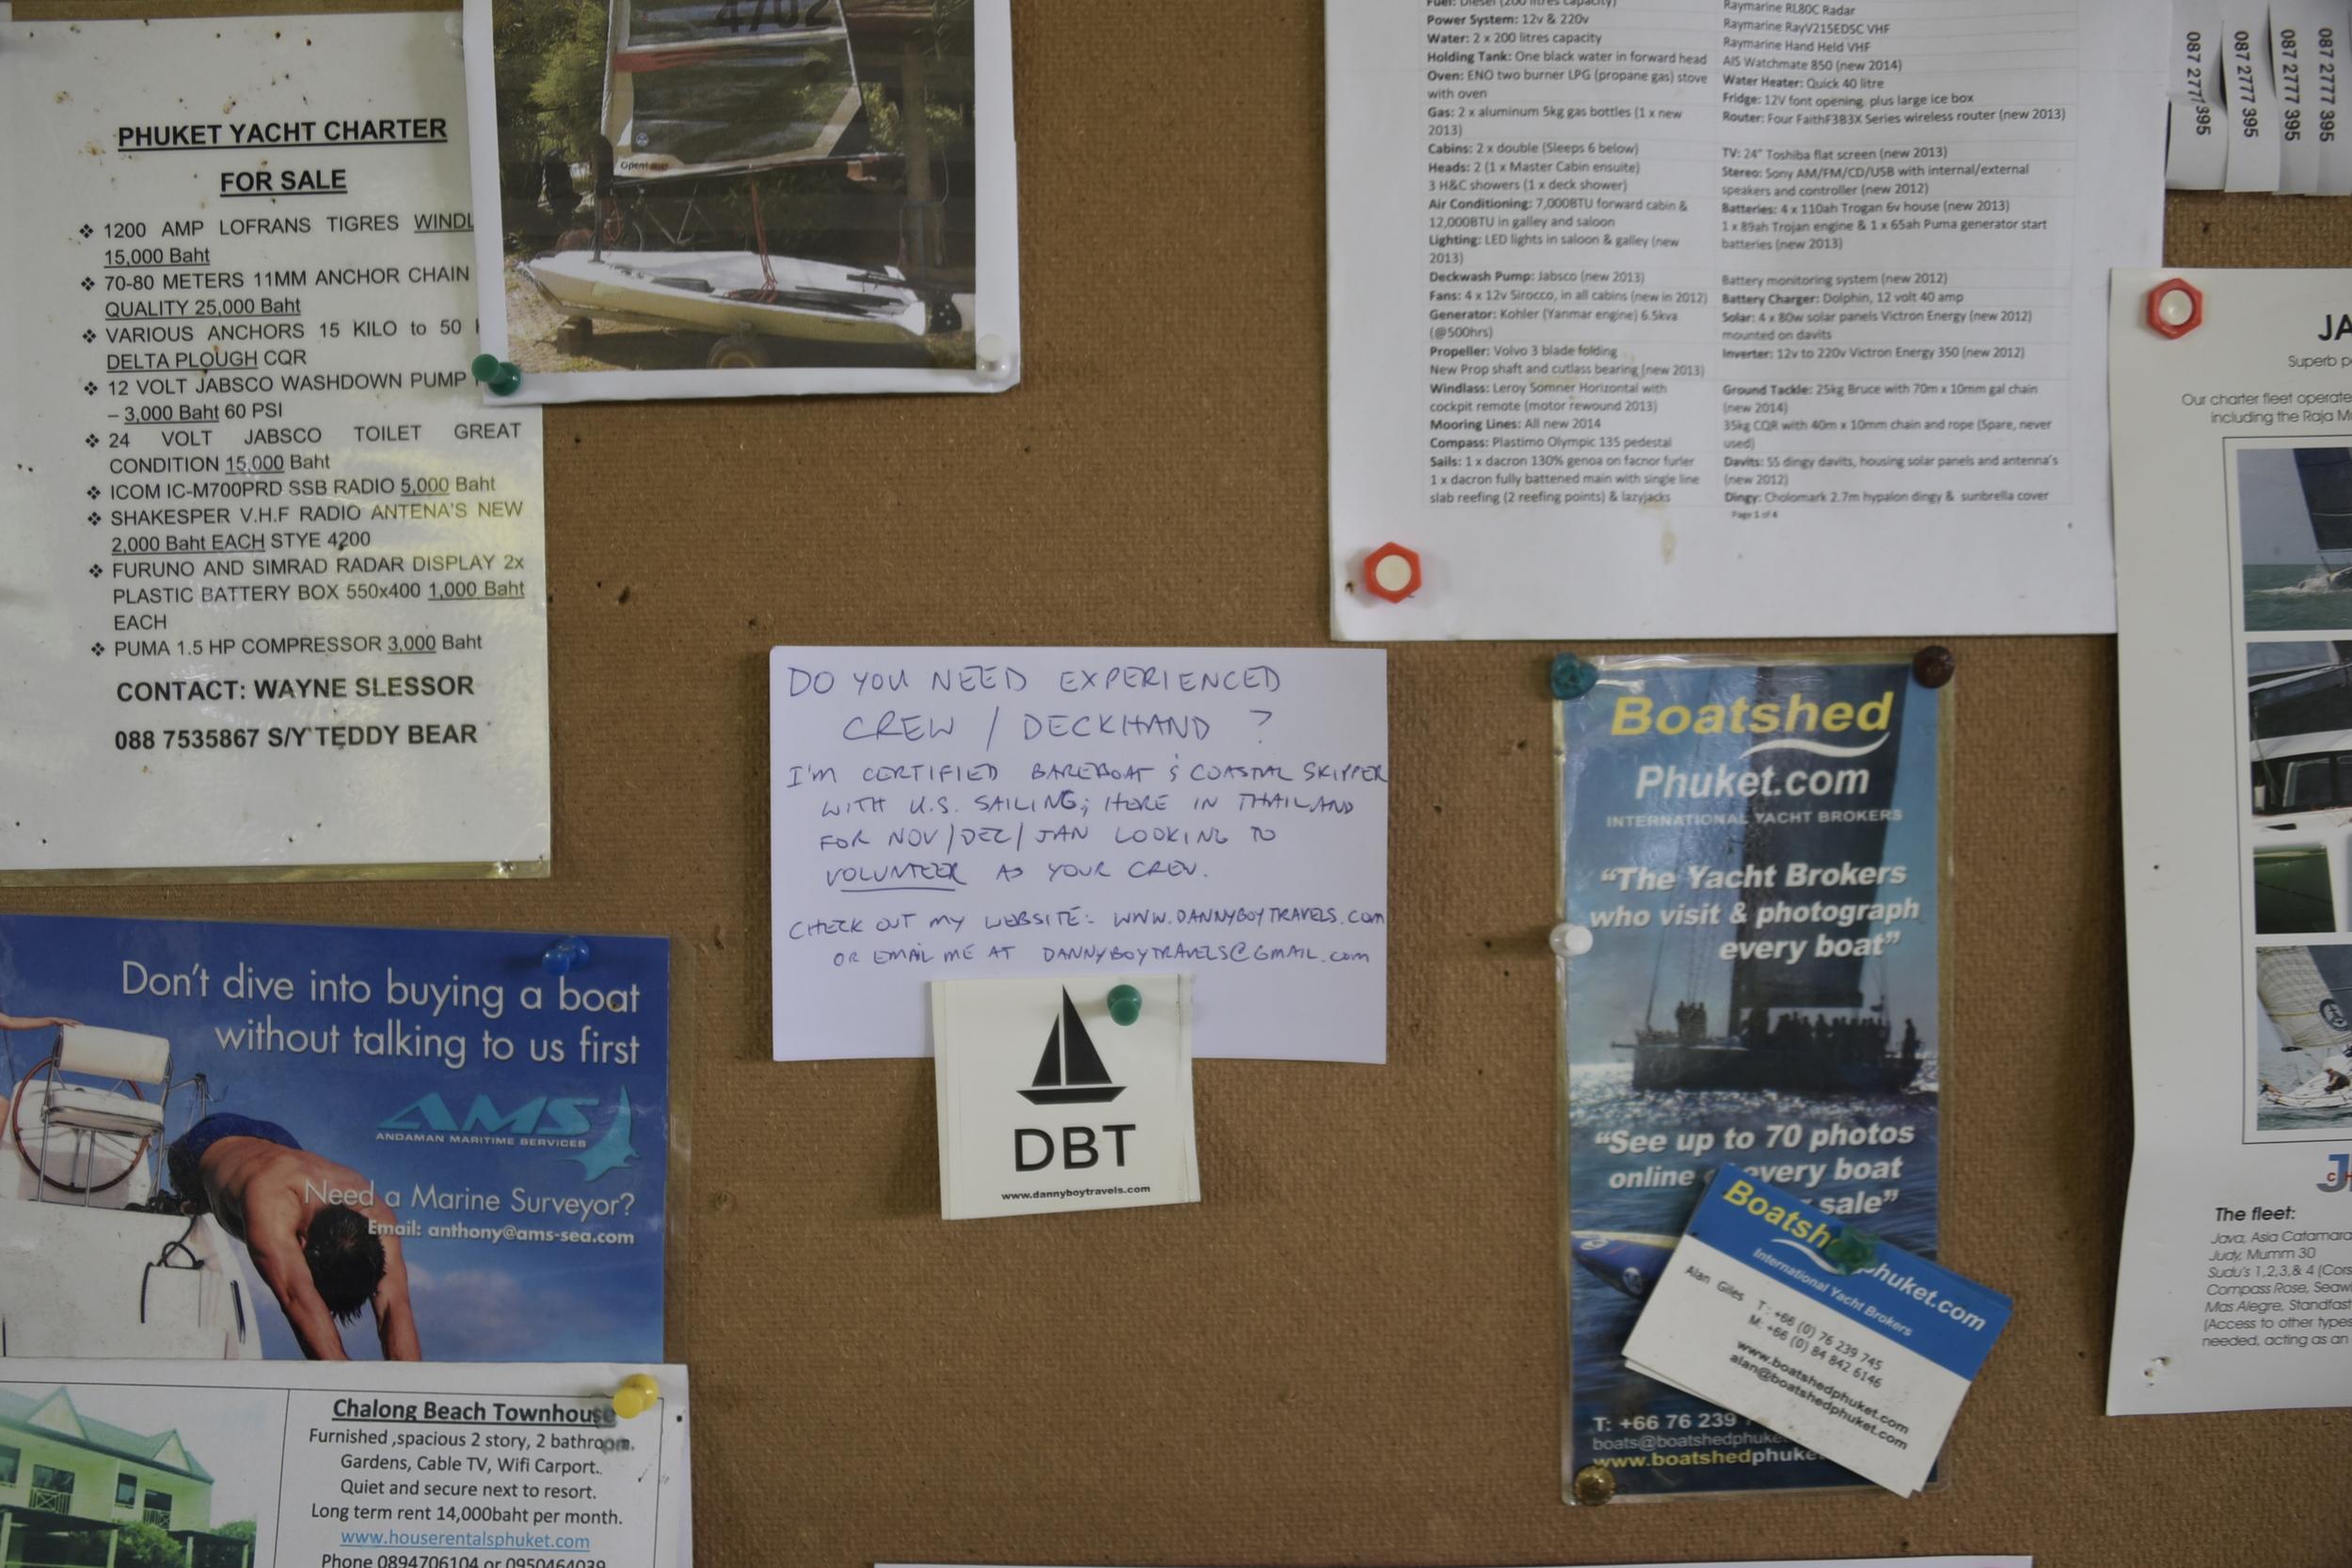 My posting at Phuket Yacht Club.